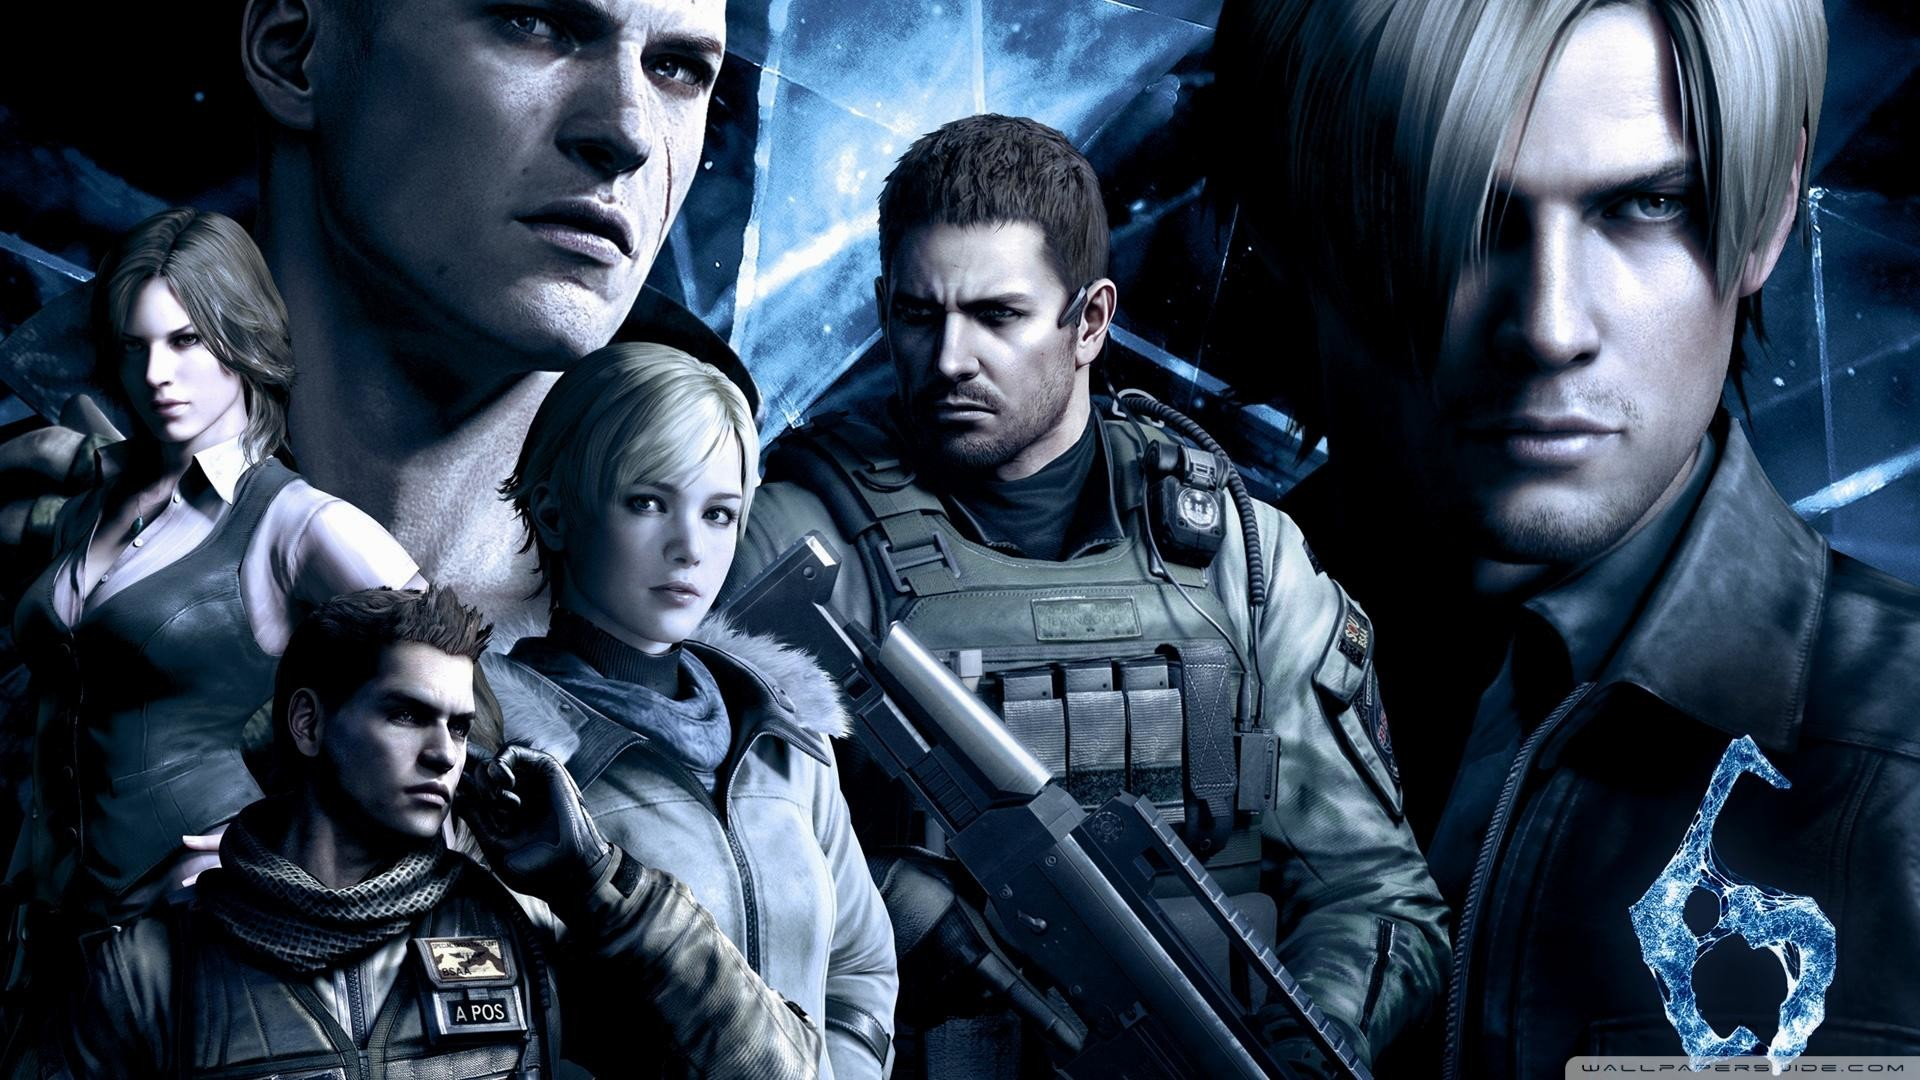 Resident-Evil-Characters-HD-desktop-High-Definition-wallpaper-